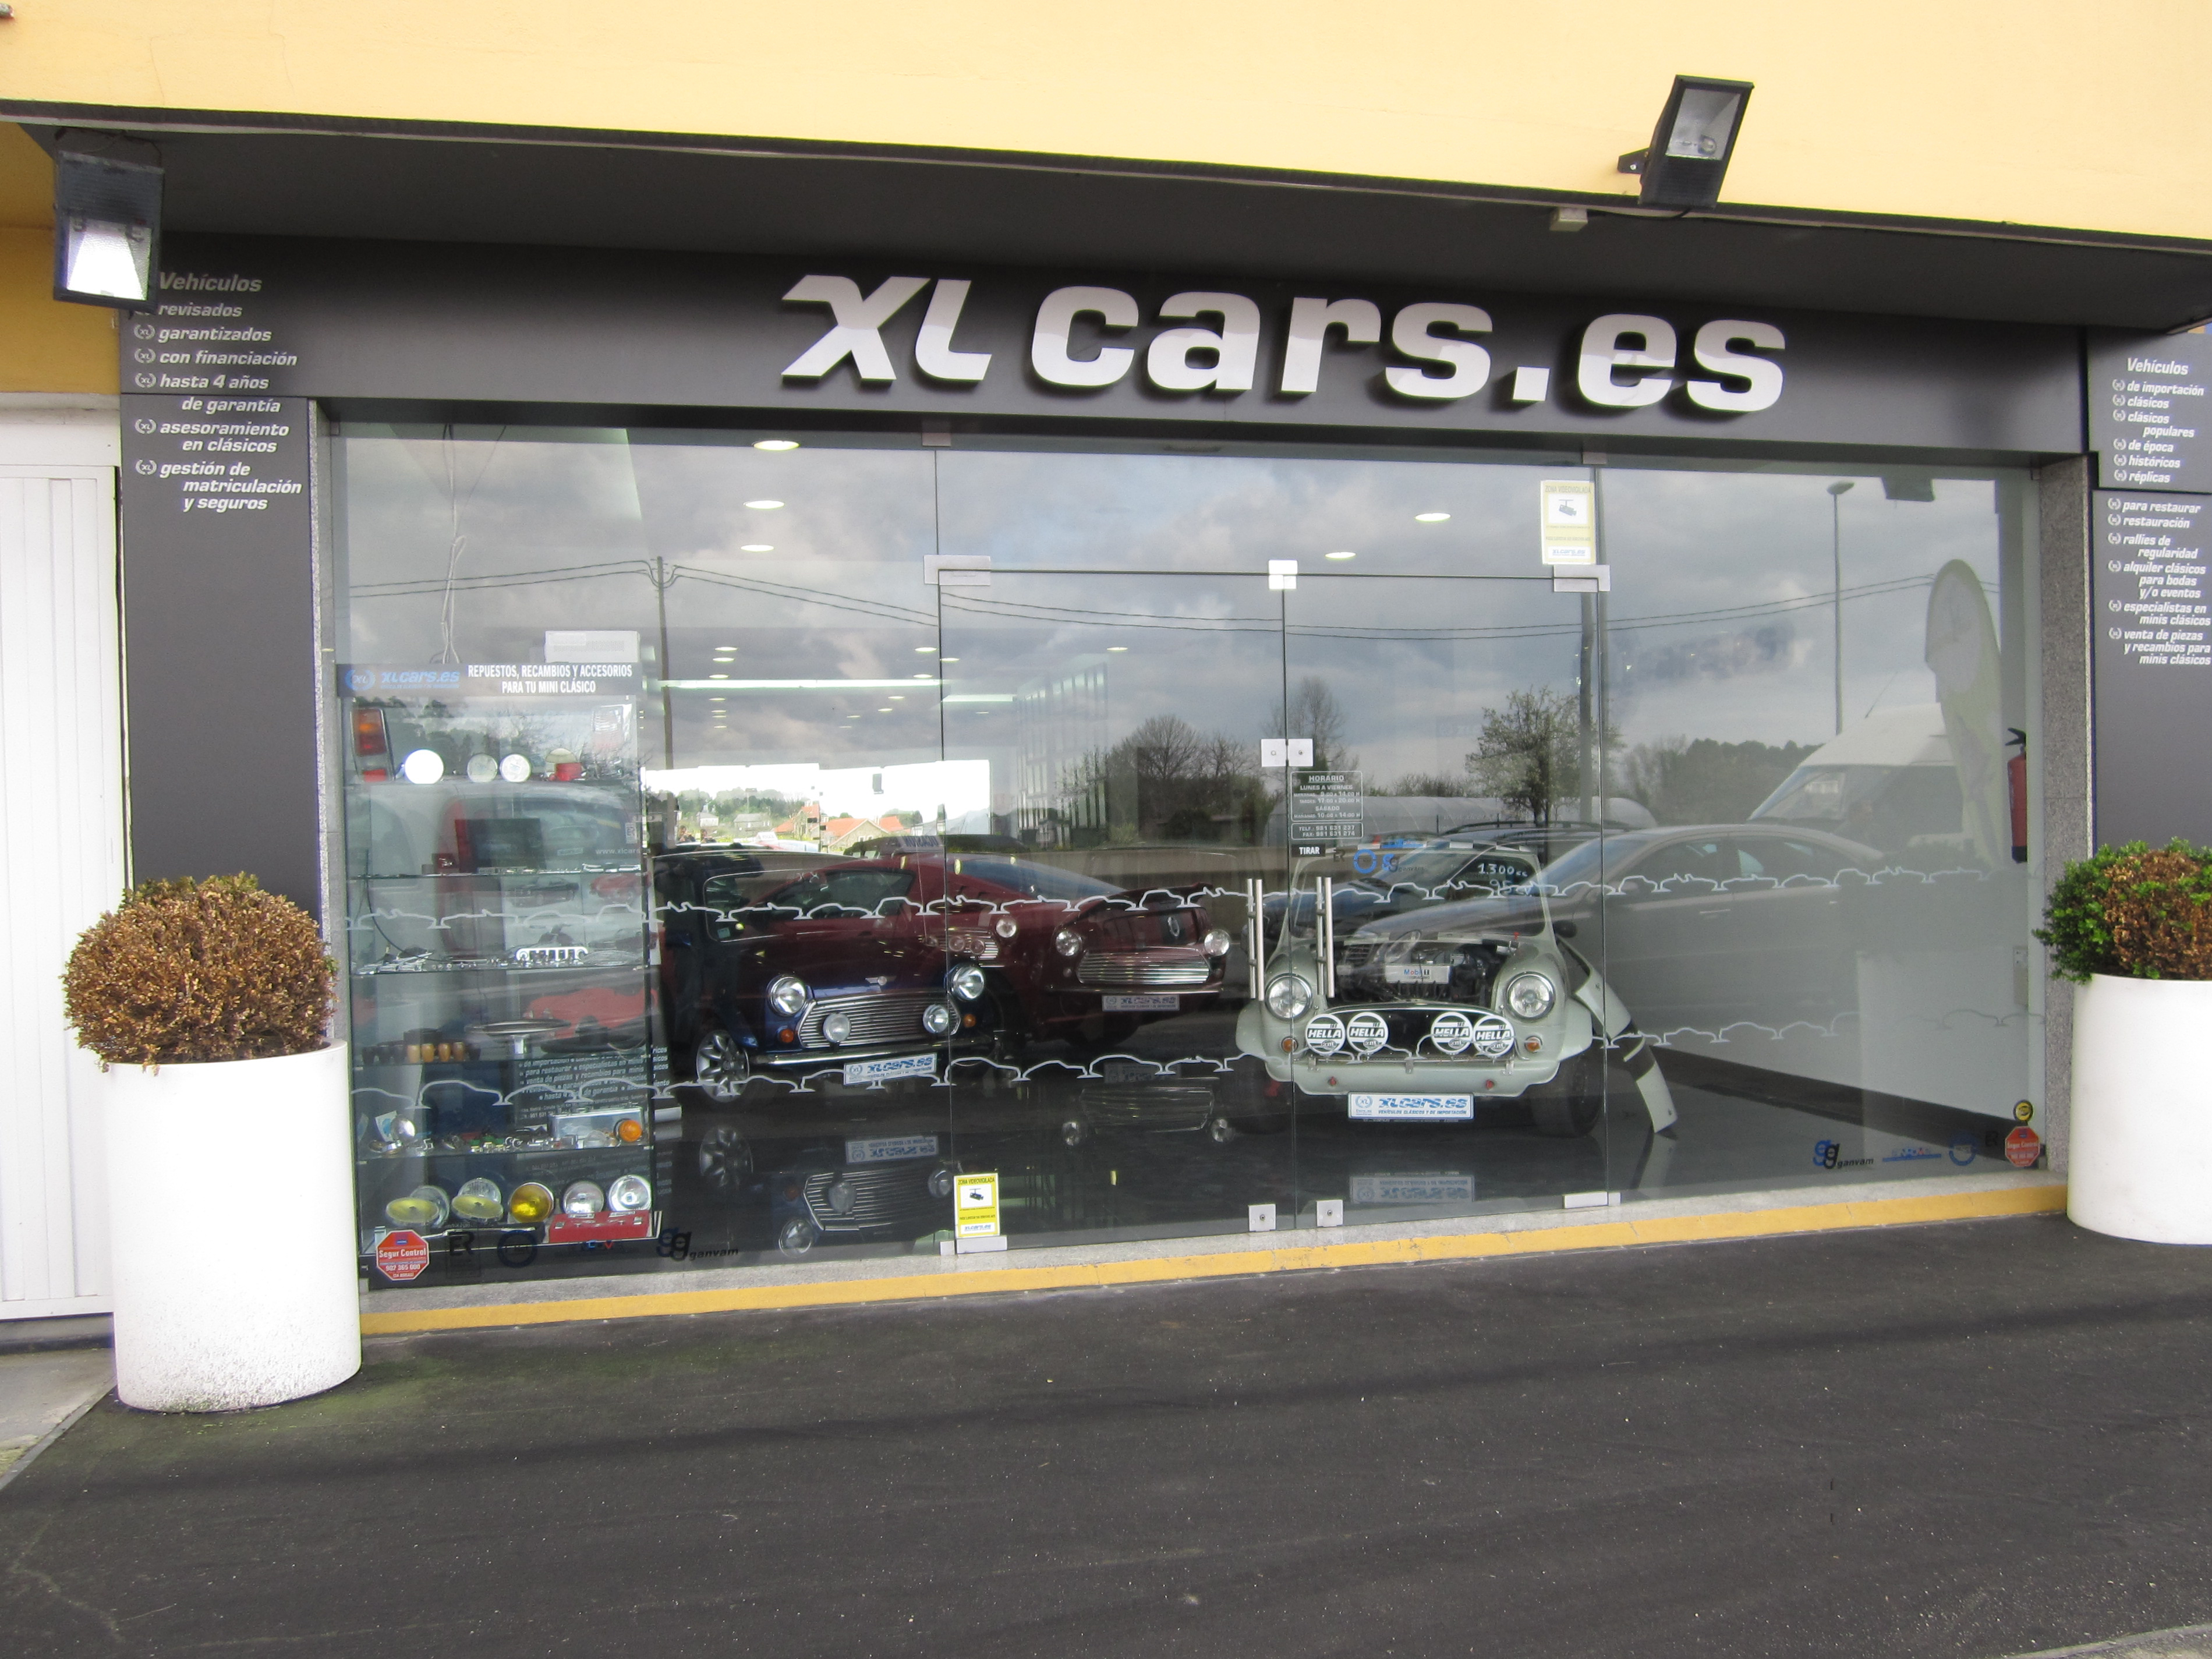 http://luzcoruna.es/wp-content/uploads/2020/03/IMG_0611-XL-Cars.jpg